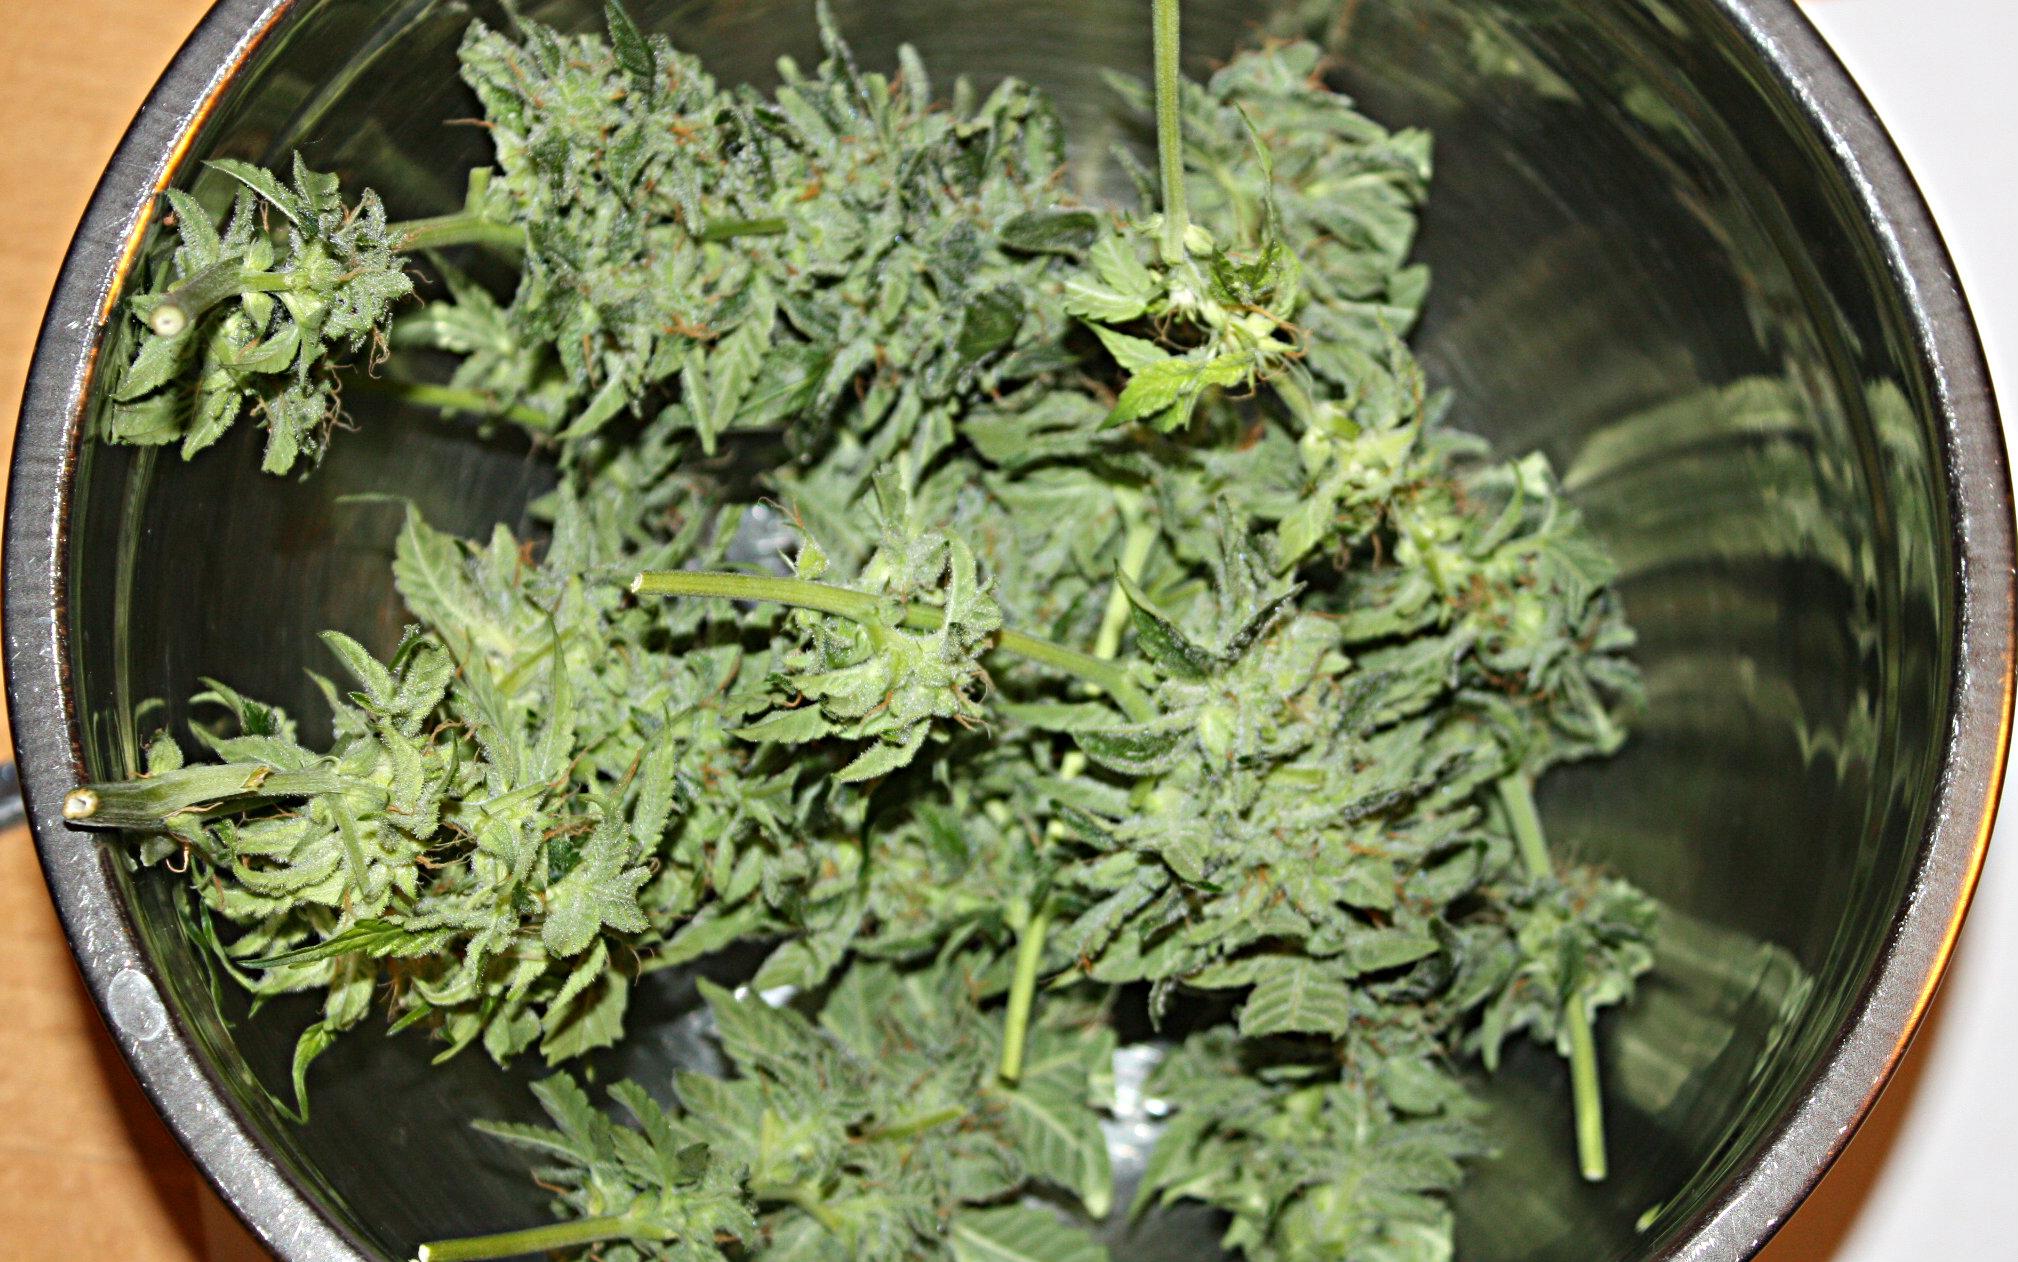 When To Harvest Autoflowers Harvest Guide Autoflowering